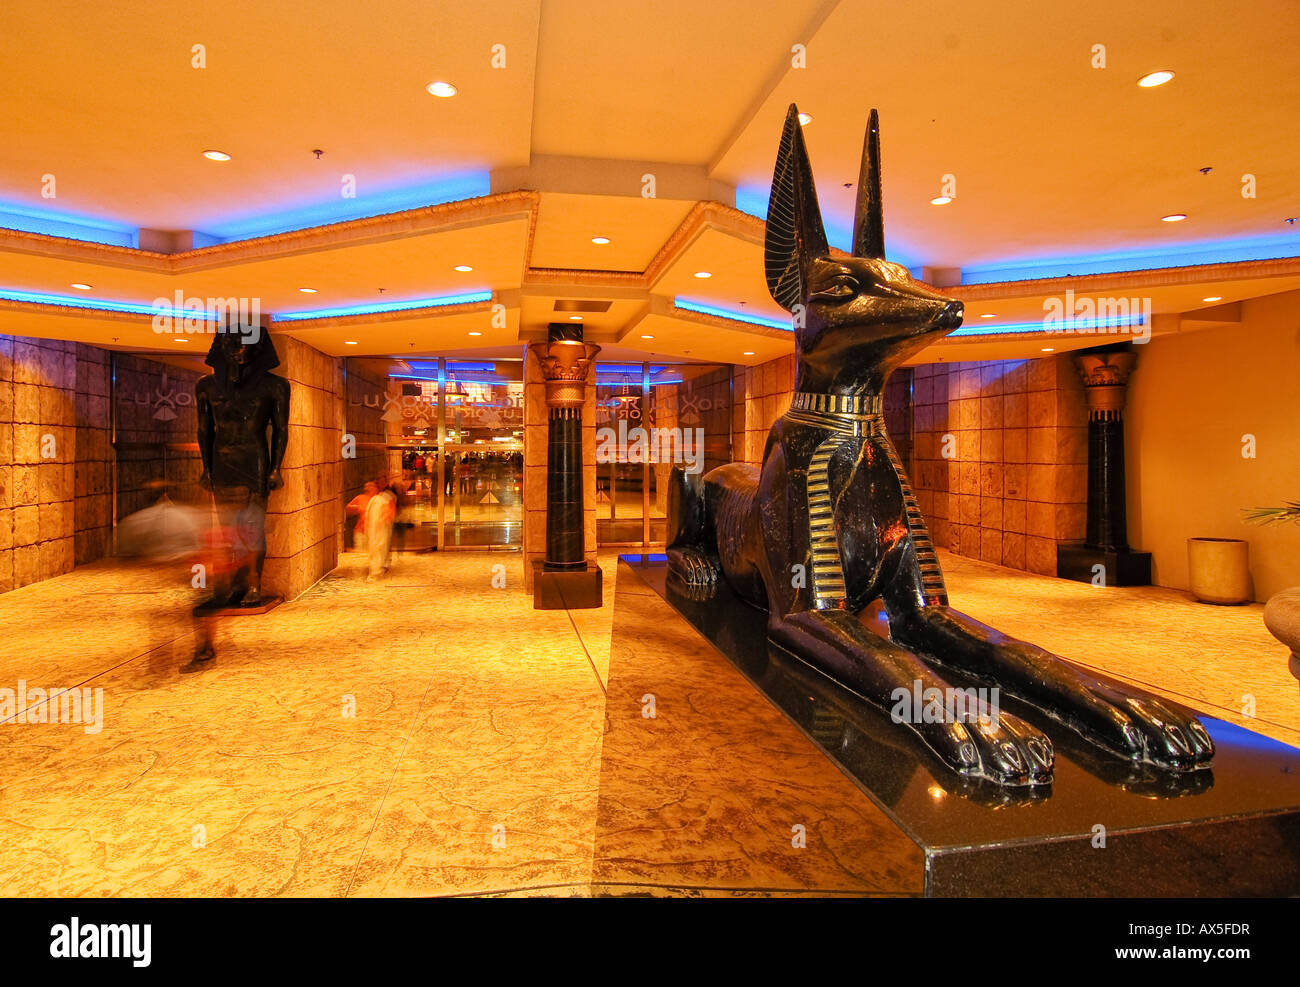 Hotel Rooms In Las Vegas Nevada